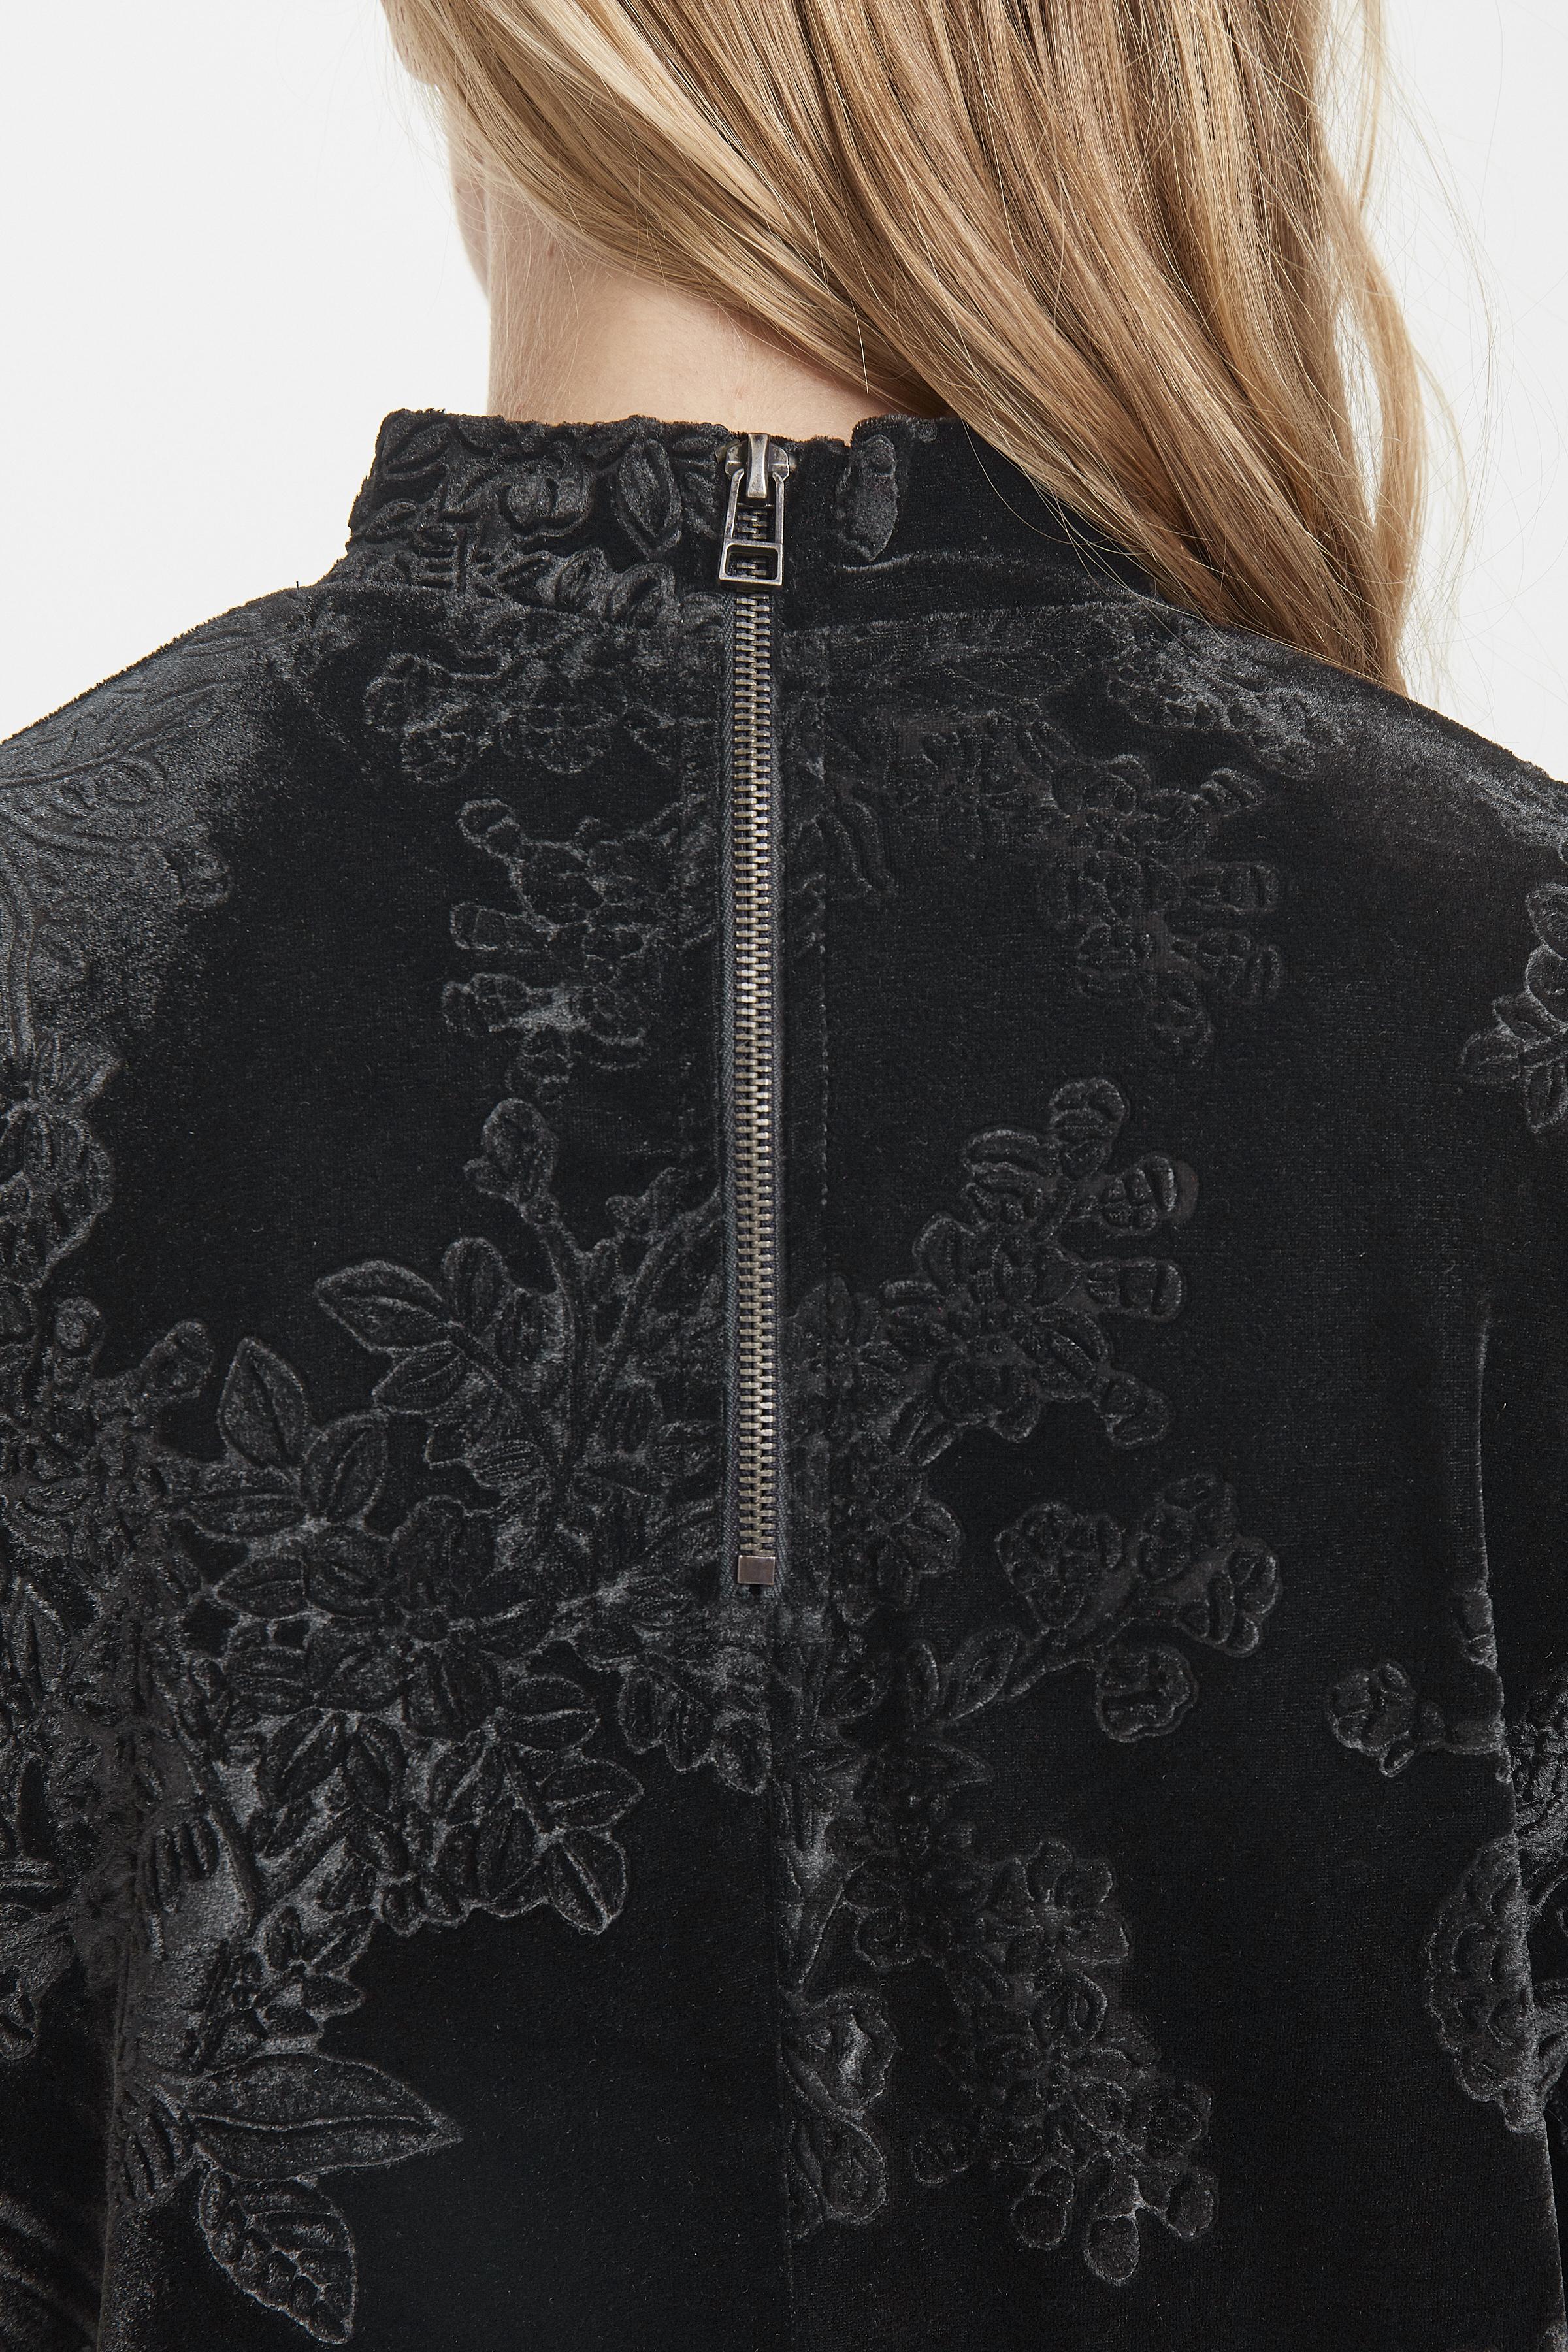 Black Blouse met lange mouwen van b.young – Koop Black Blouse met lange mouwen hier van size XS-XXL